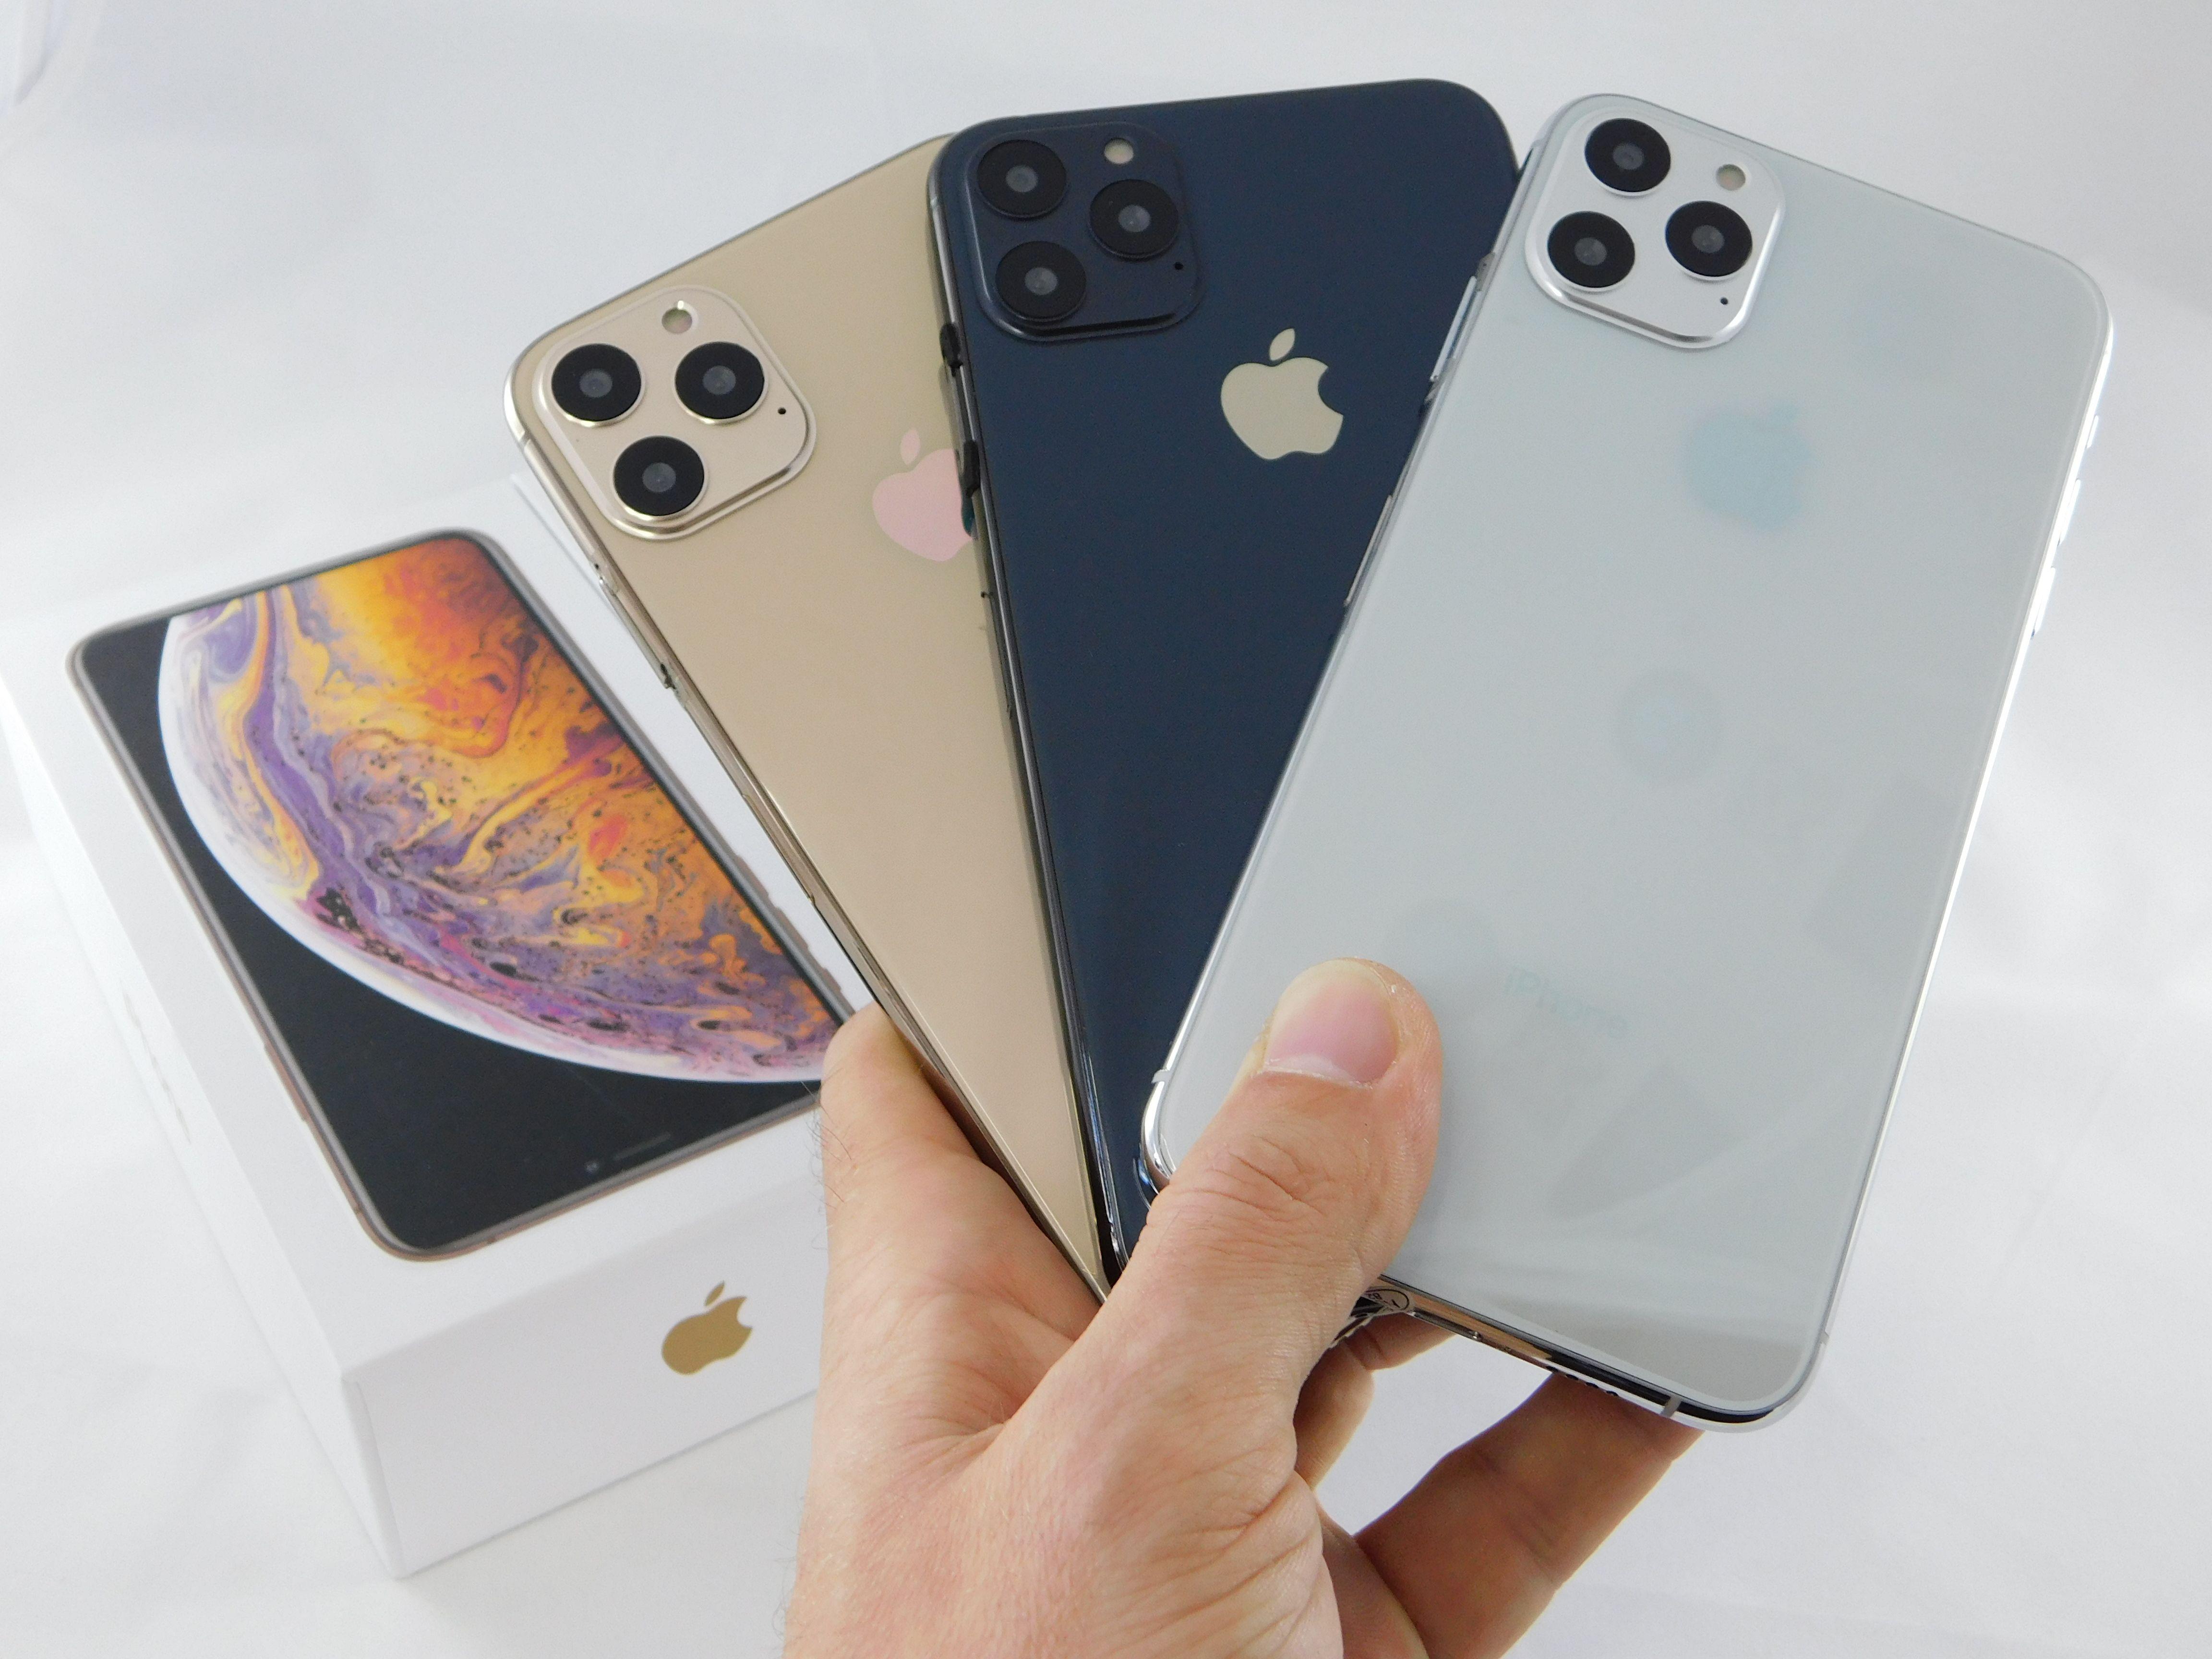 Miniobzor Kopii Iphone 11 Pro Max Samoj Luchshej Repliki